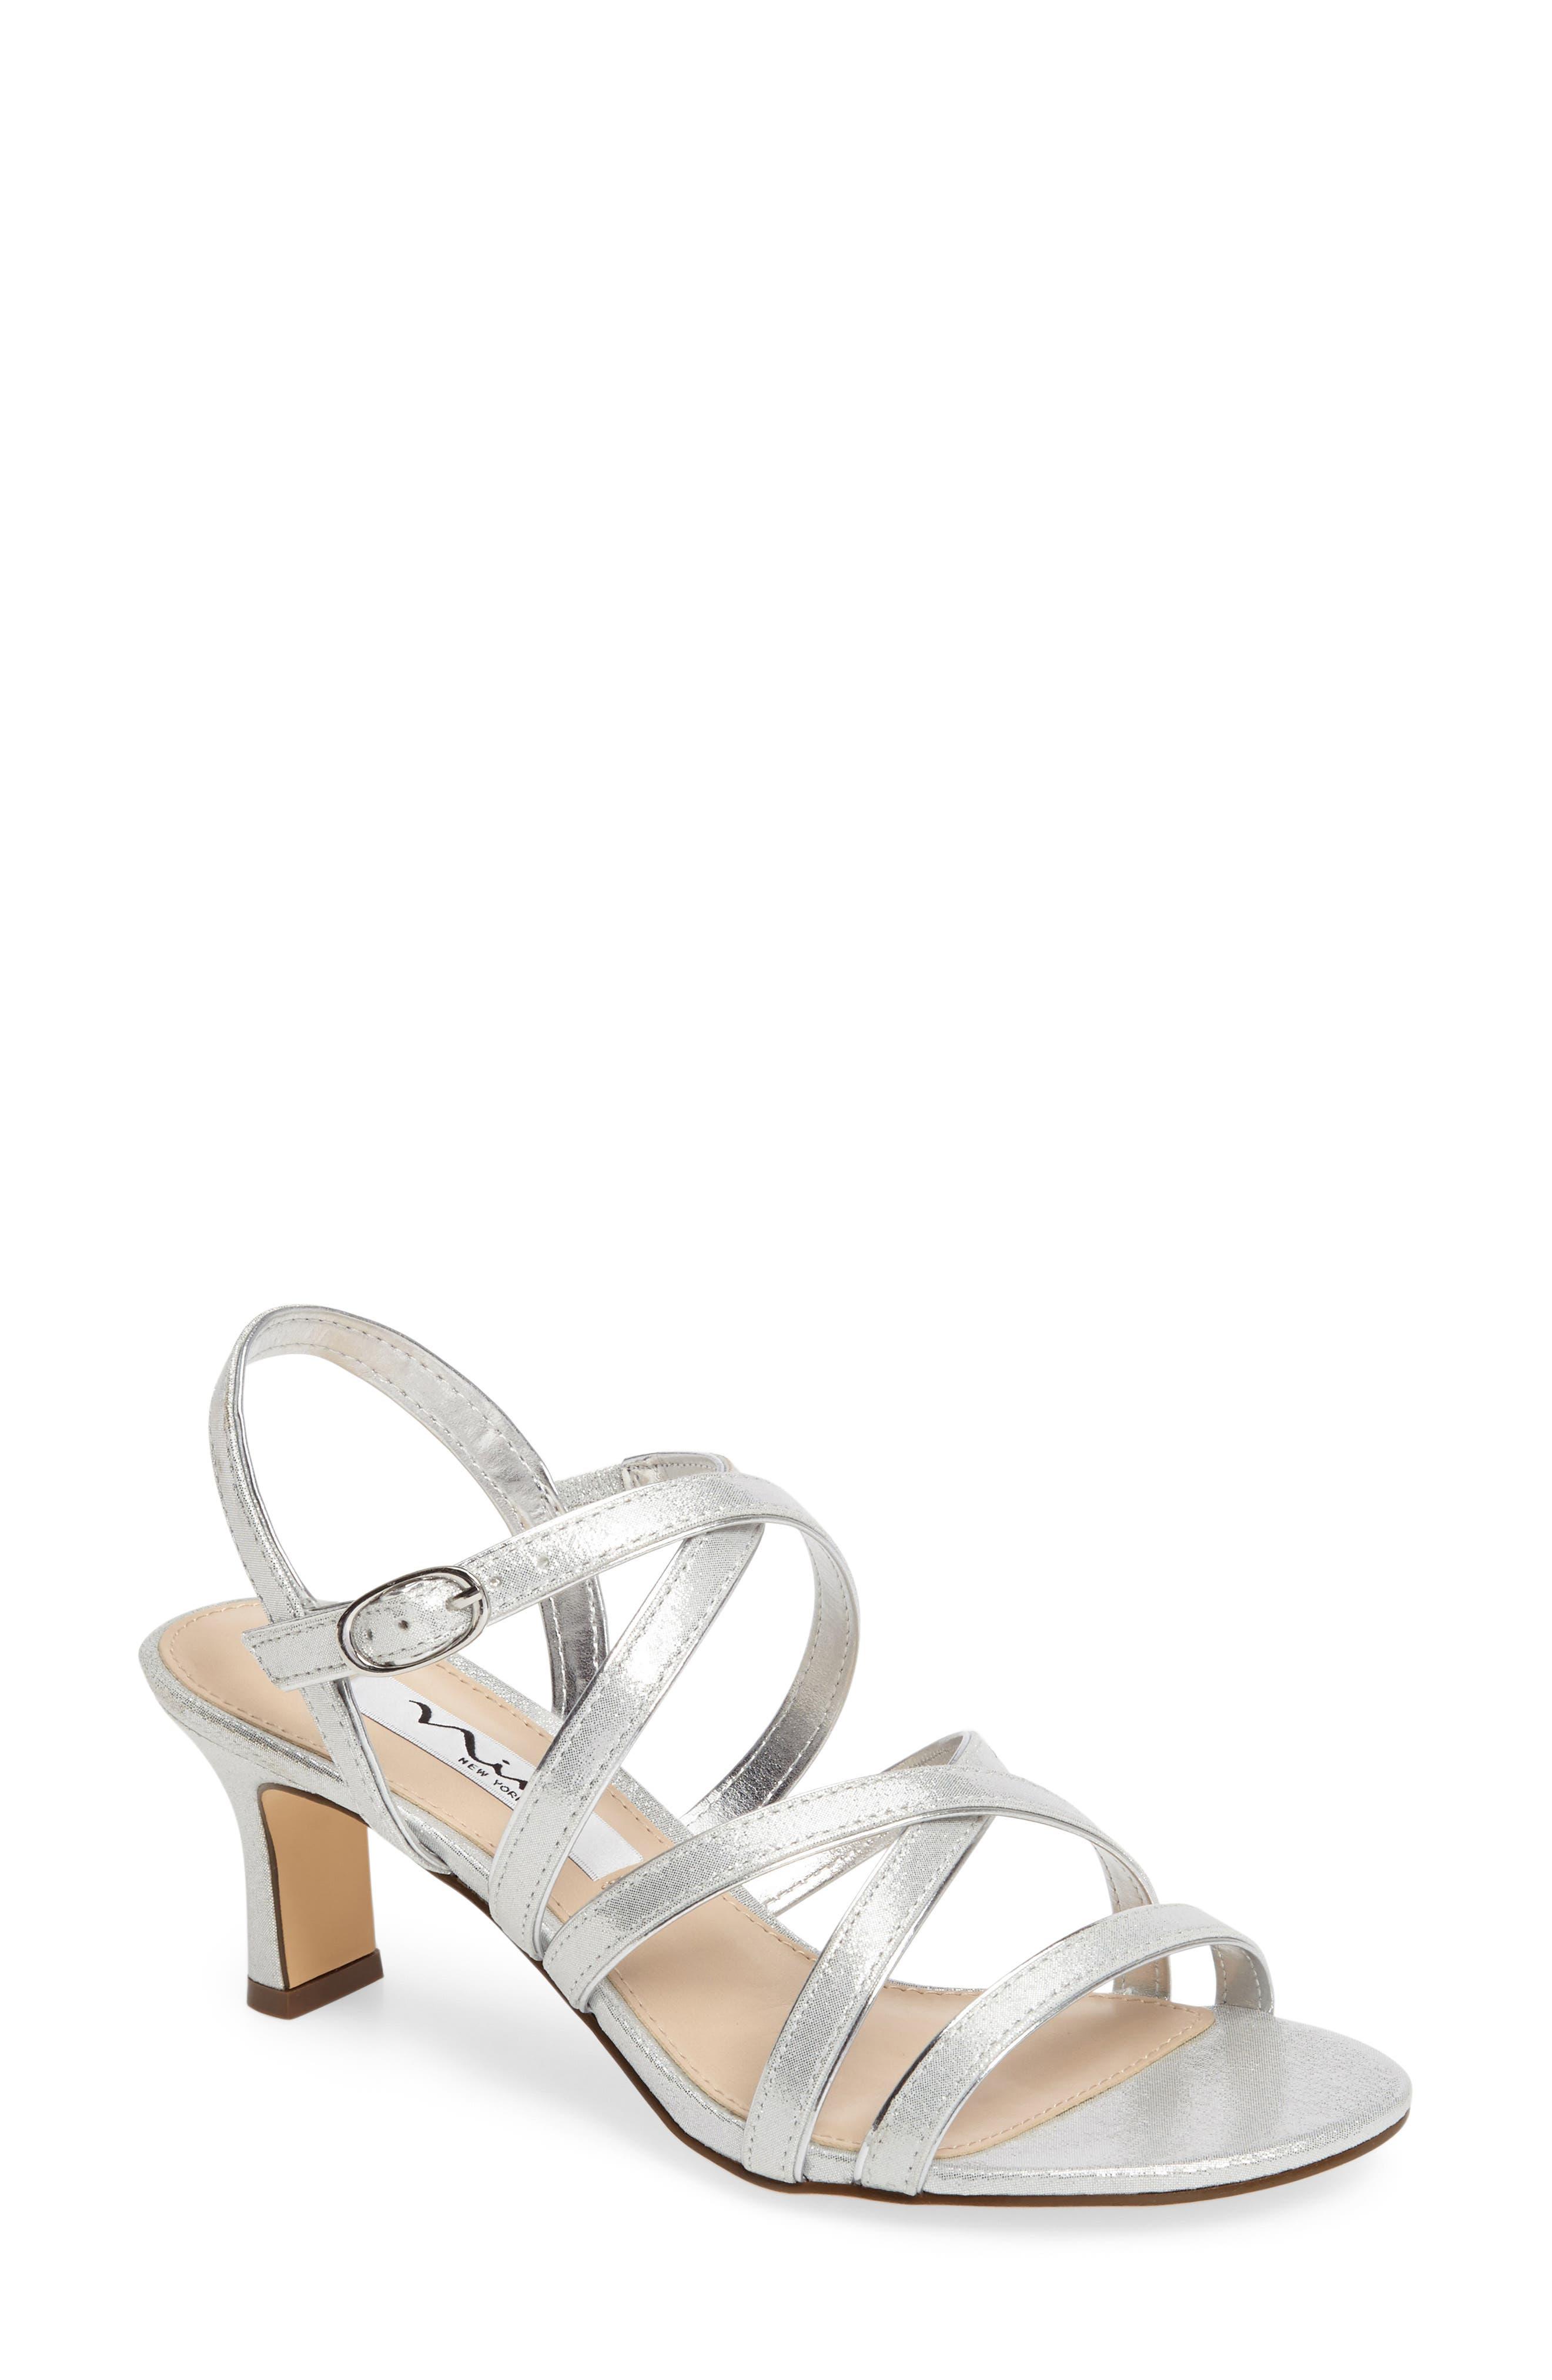 Alternate Image 1 Selected - Nina Genaya Strappy Evening Sandal (Women)